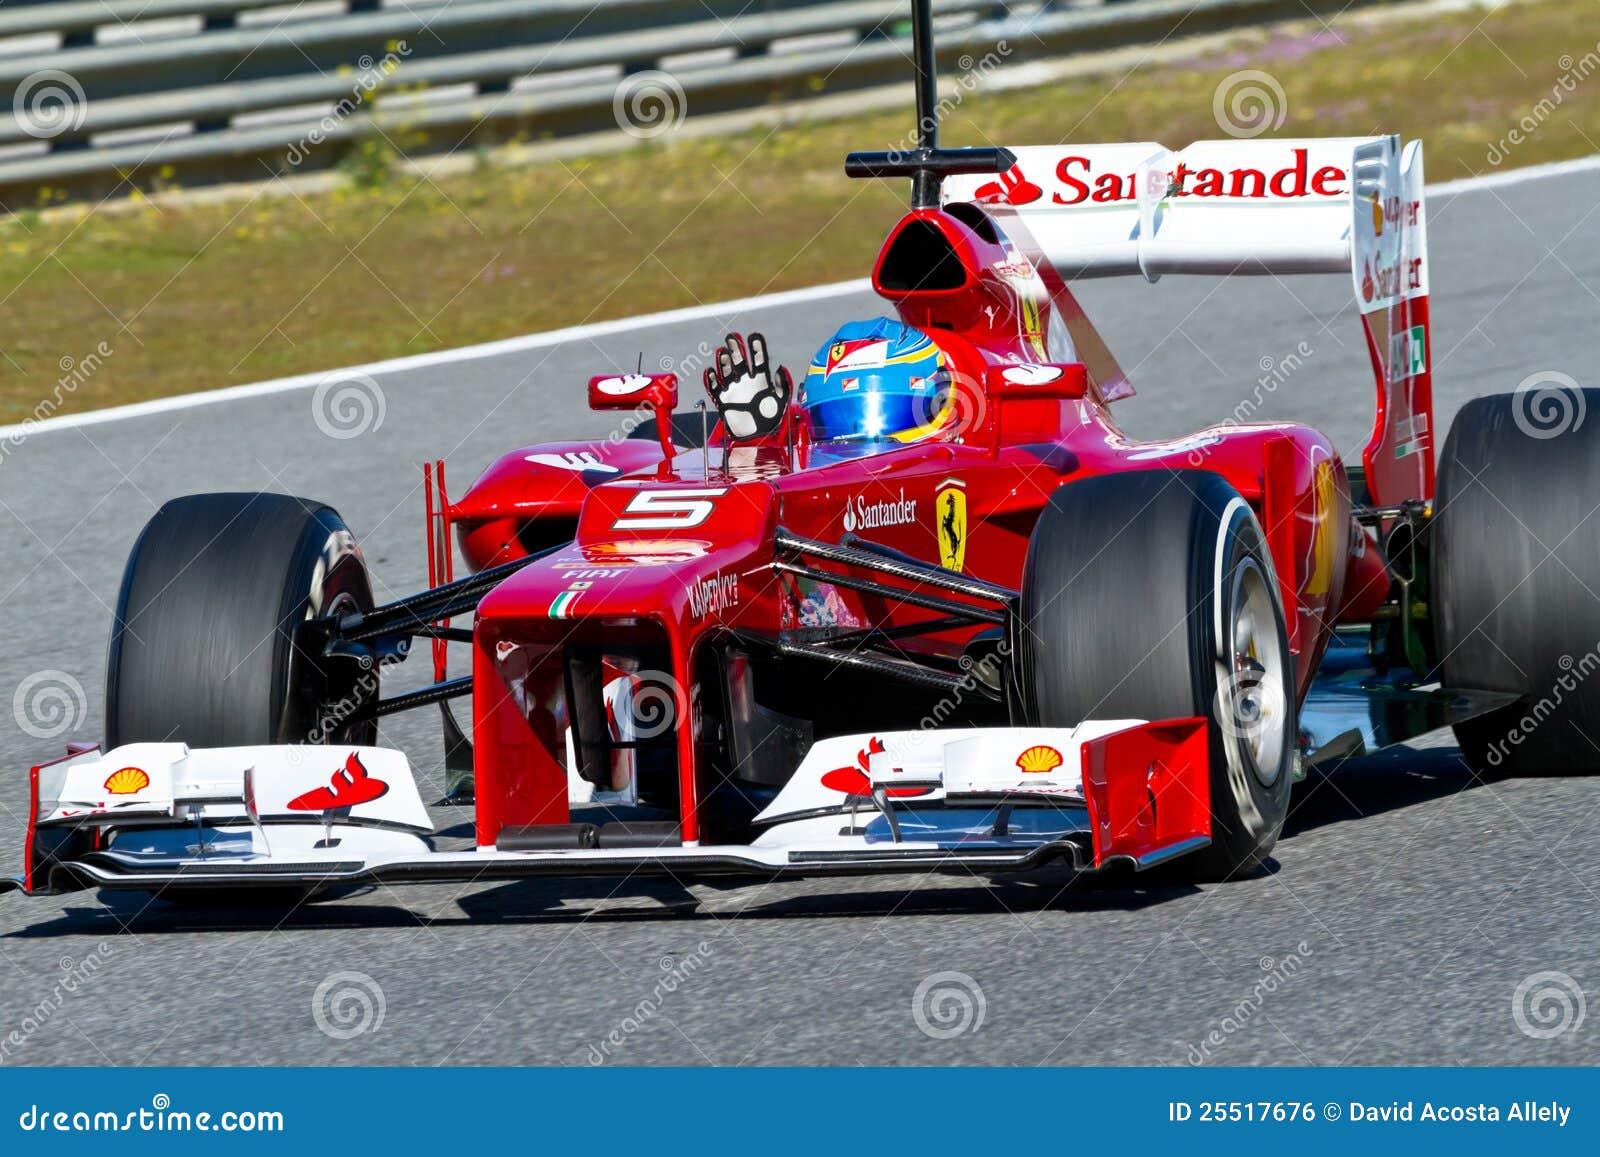 Scuderia Ferrari F1 Fernando Alonso 2012 Redaktionelles Foto Bild Von Drehzahl Accelerate 25517676